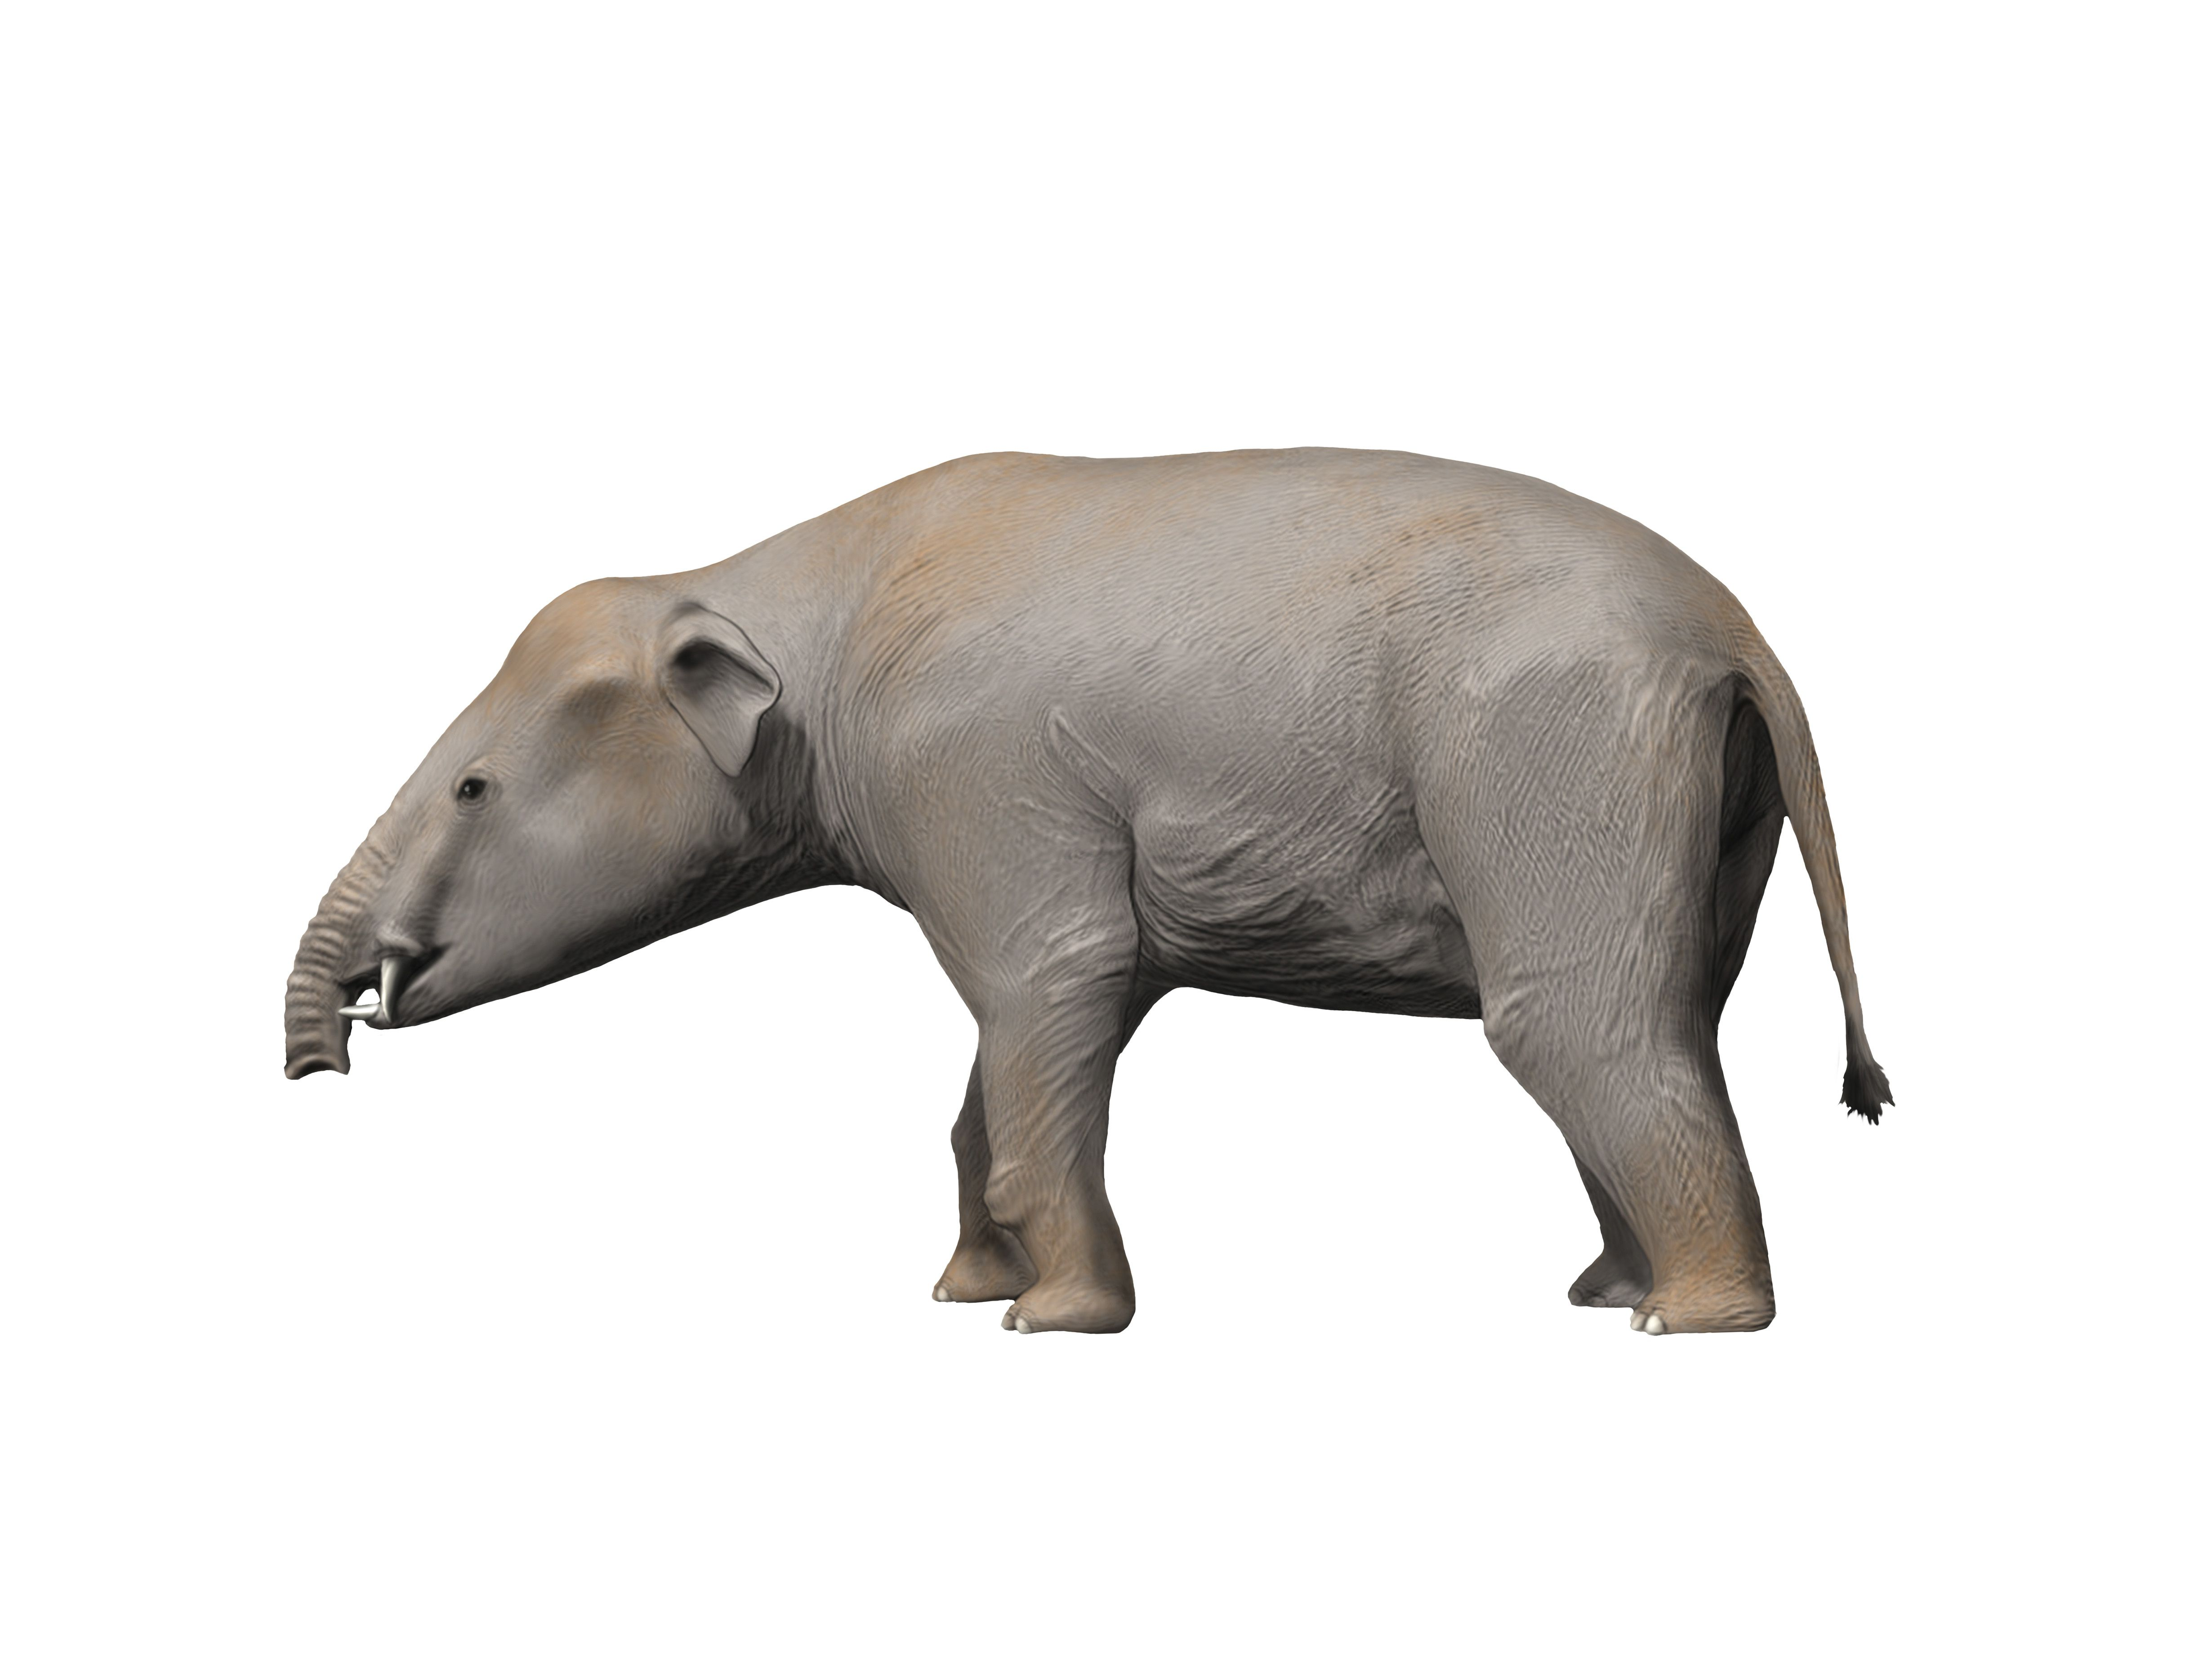 Palaeomastodon graphic rendering